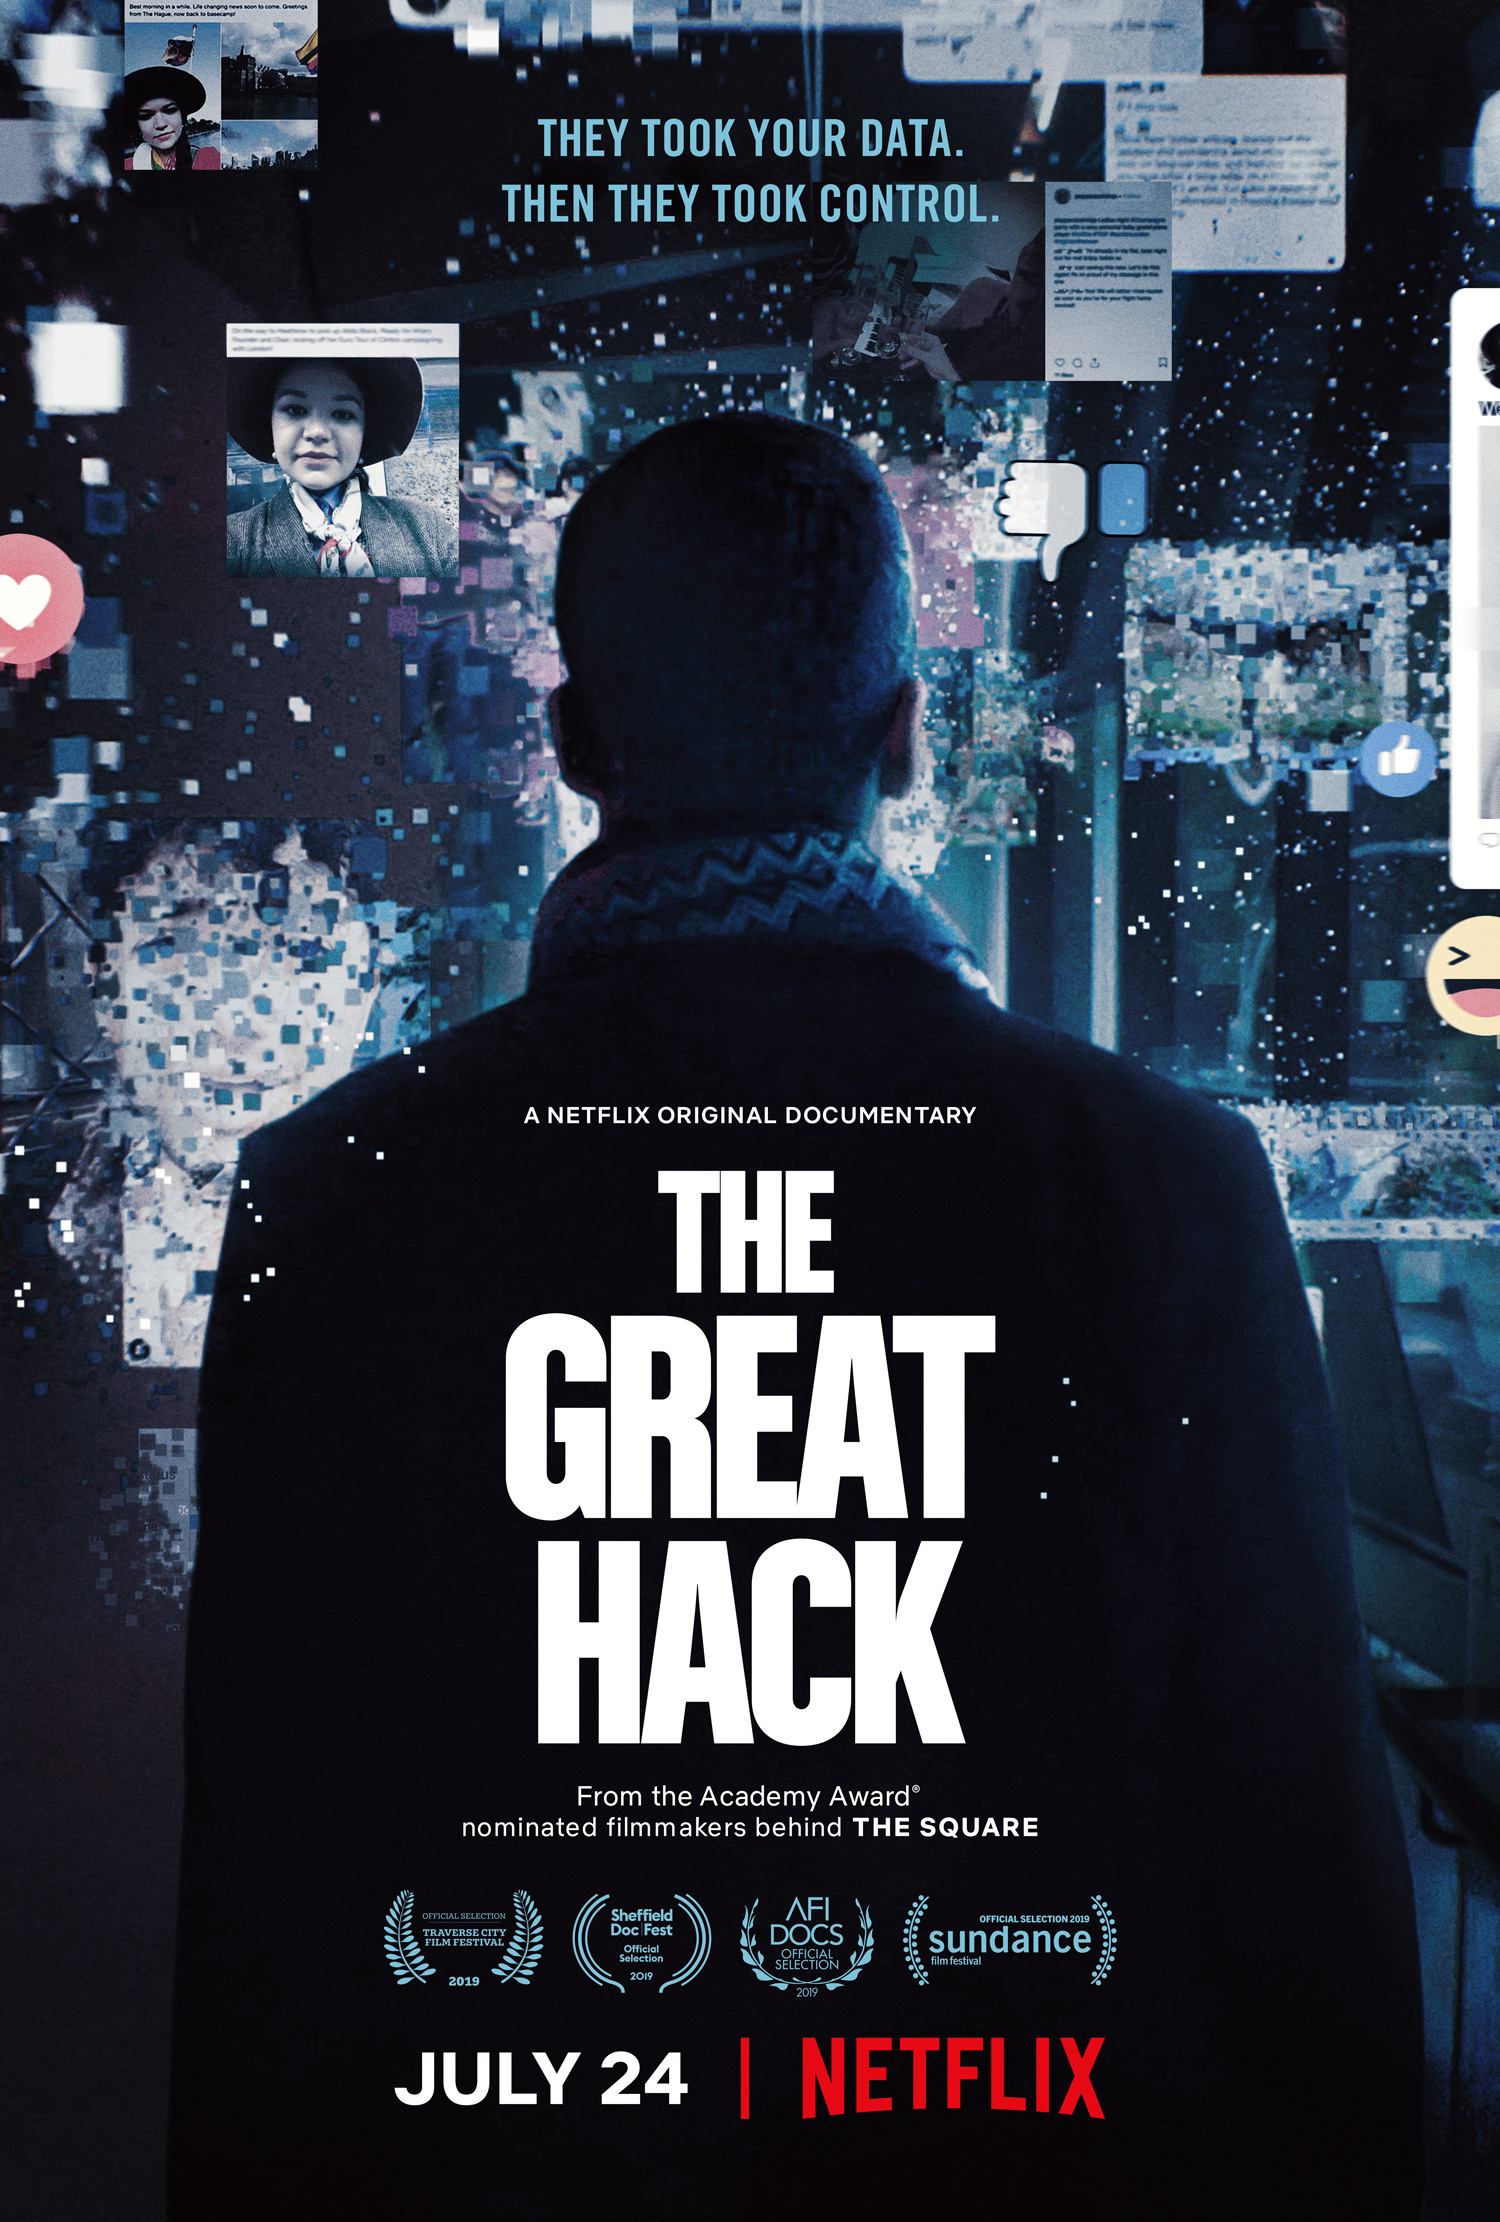 دانلود زیرنویس فارسی فیلم The Great Hack